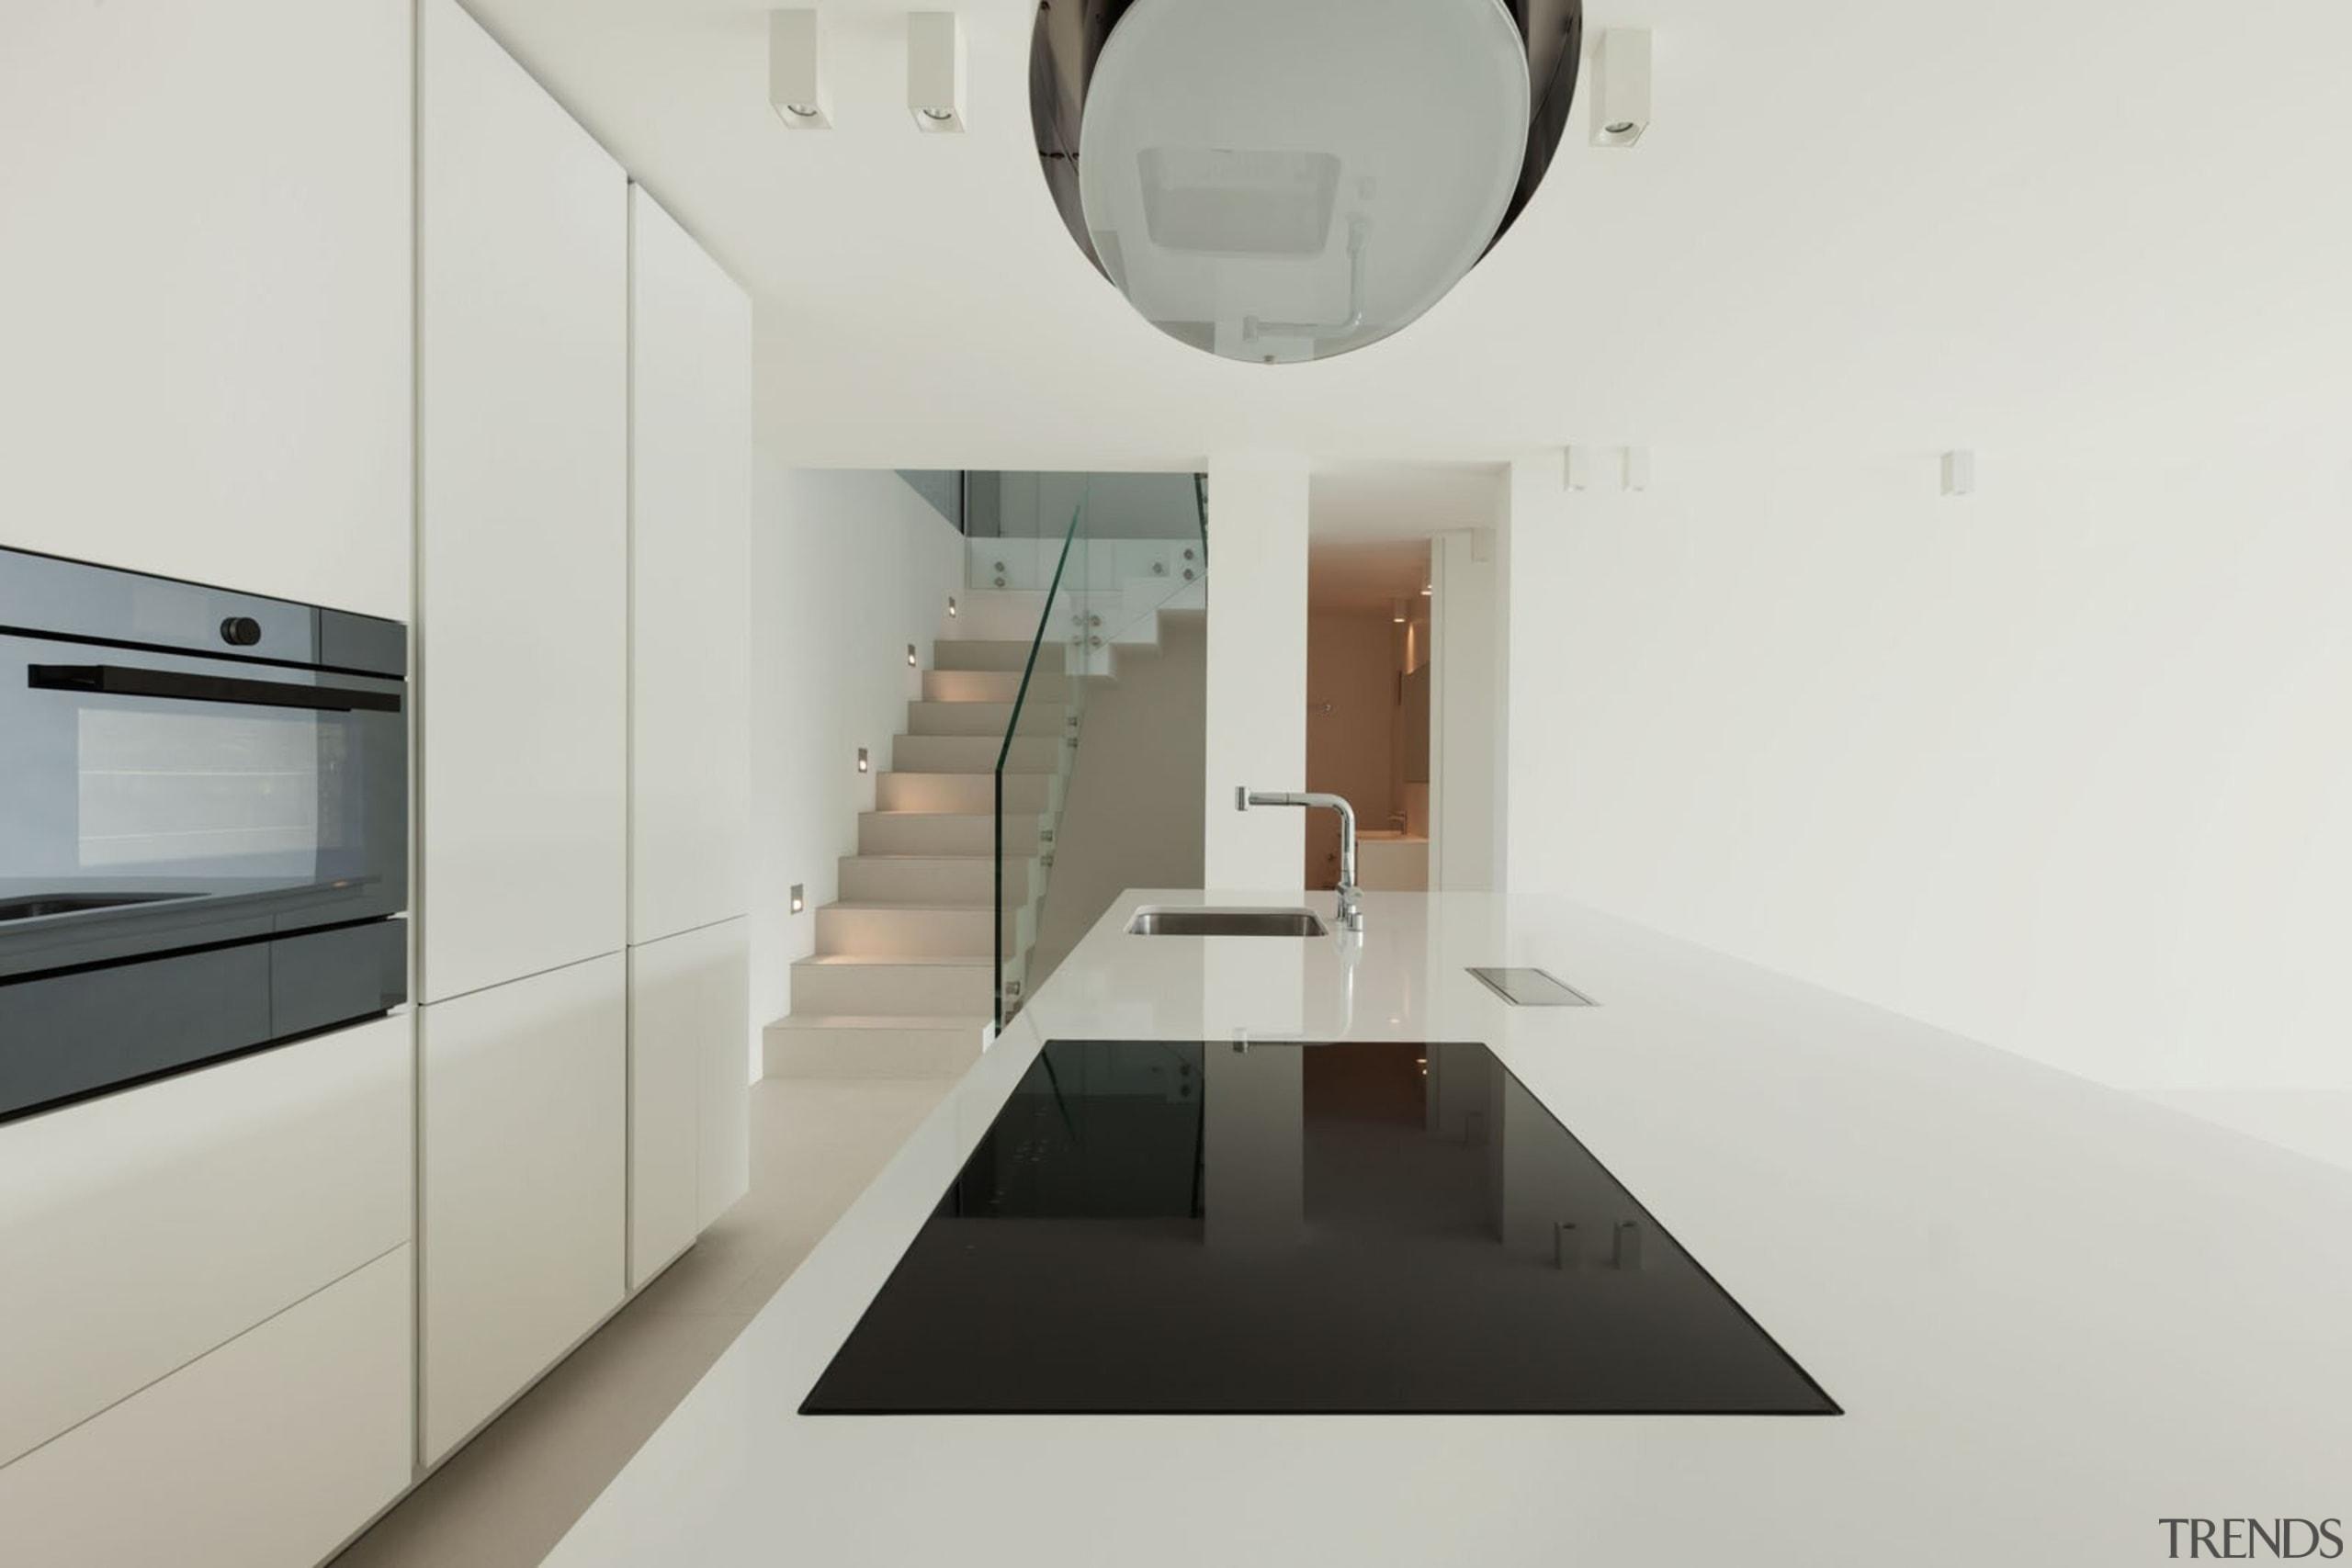 Silestone Kitchen - Royal reef - Silestone Kitchen architecture, house, interior design, product design, white